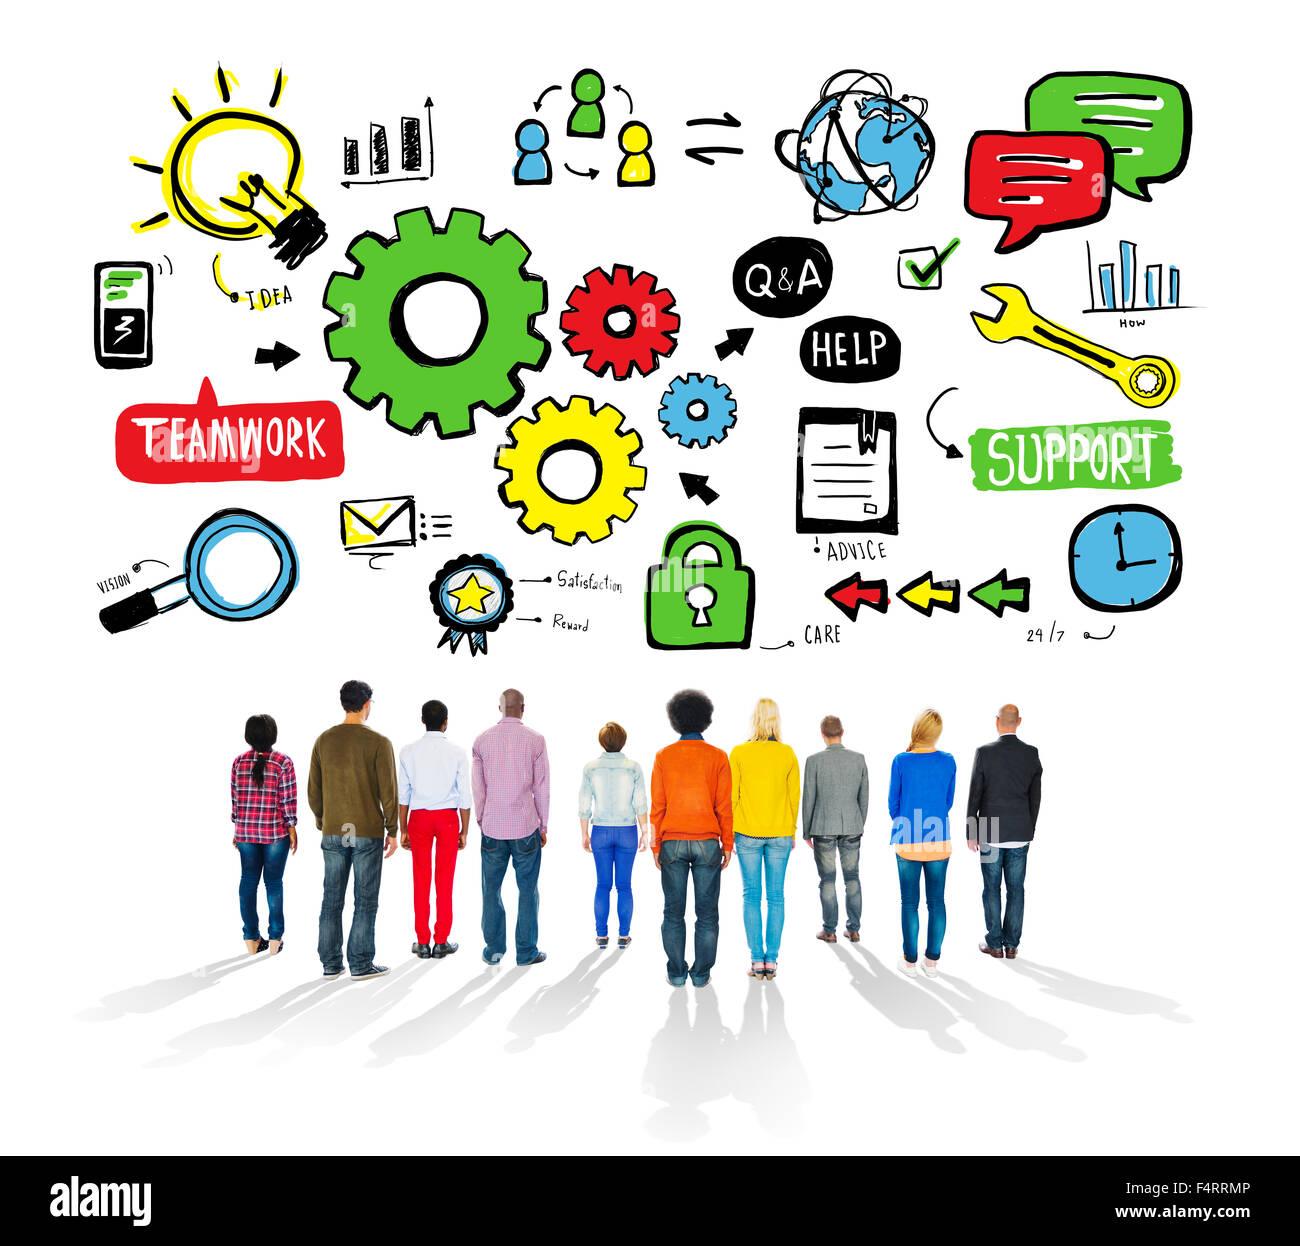 Ico partnership making